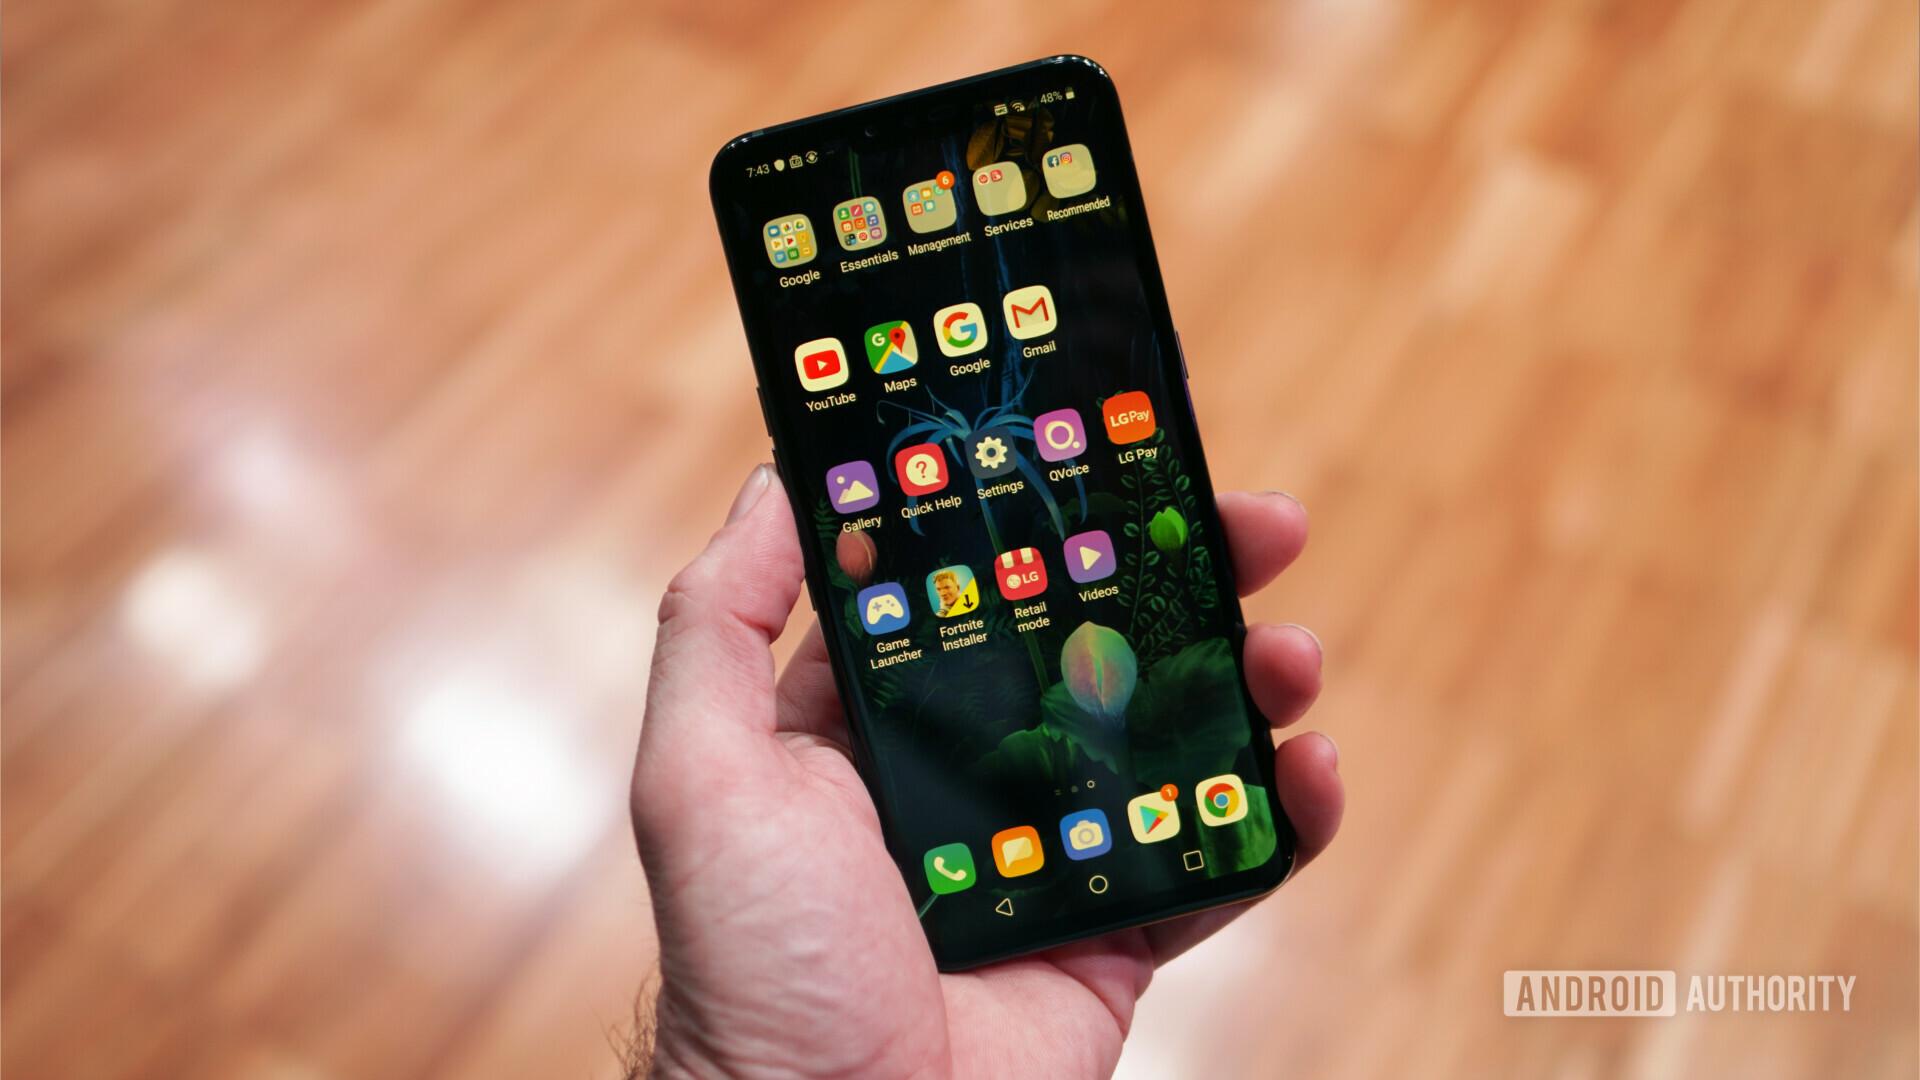 LG V50 ThinQ 5G app screen